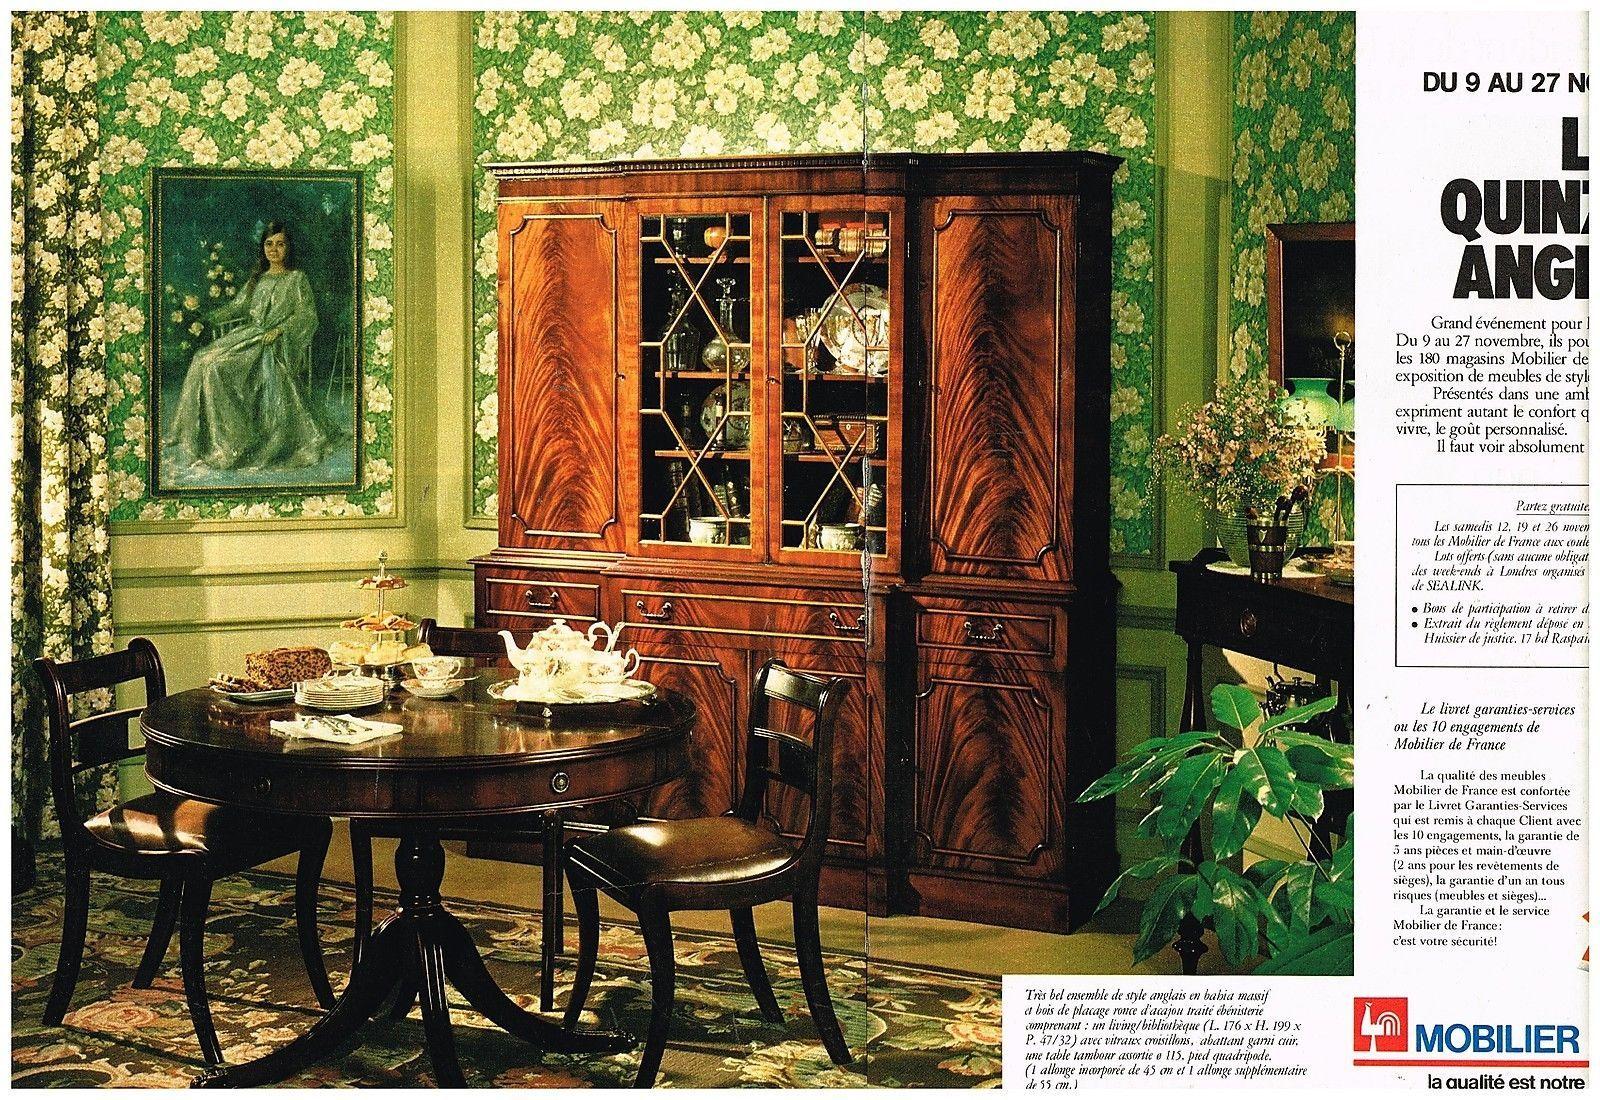 publicit advertising 1977 2 pages meubles mobilier de france for sale eur 5 00 see photos. Black Bedroom Furniture Sets. Home Design Ideas